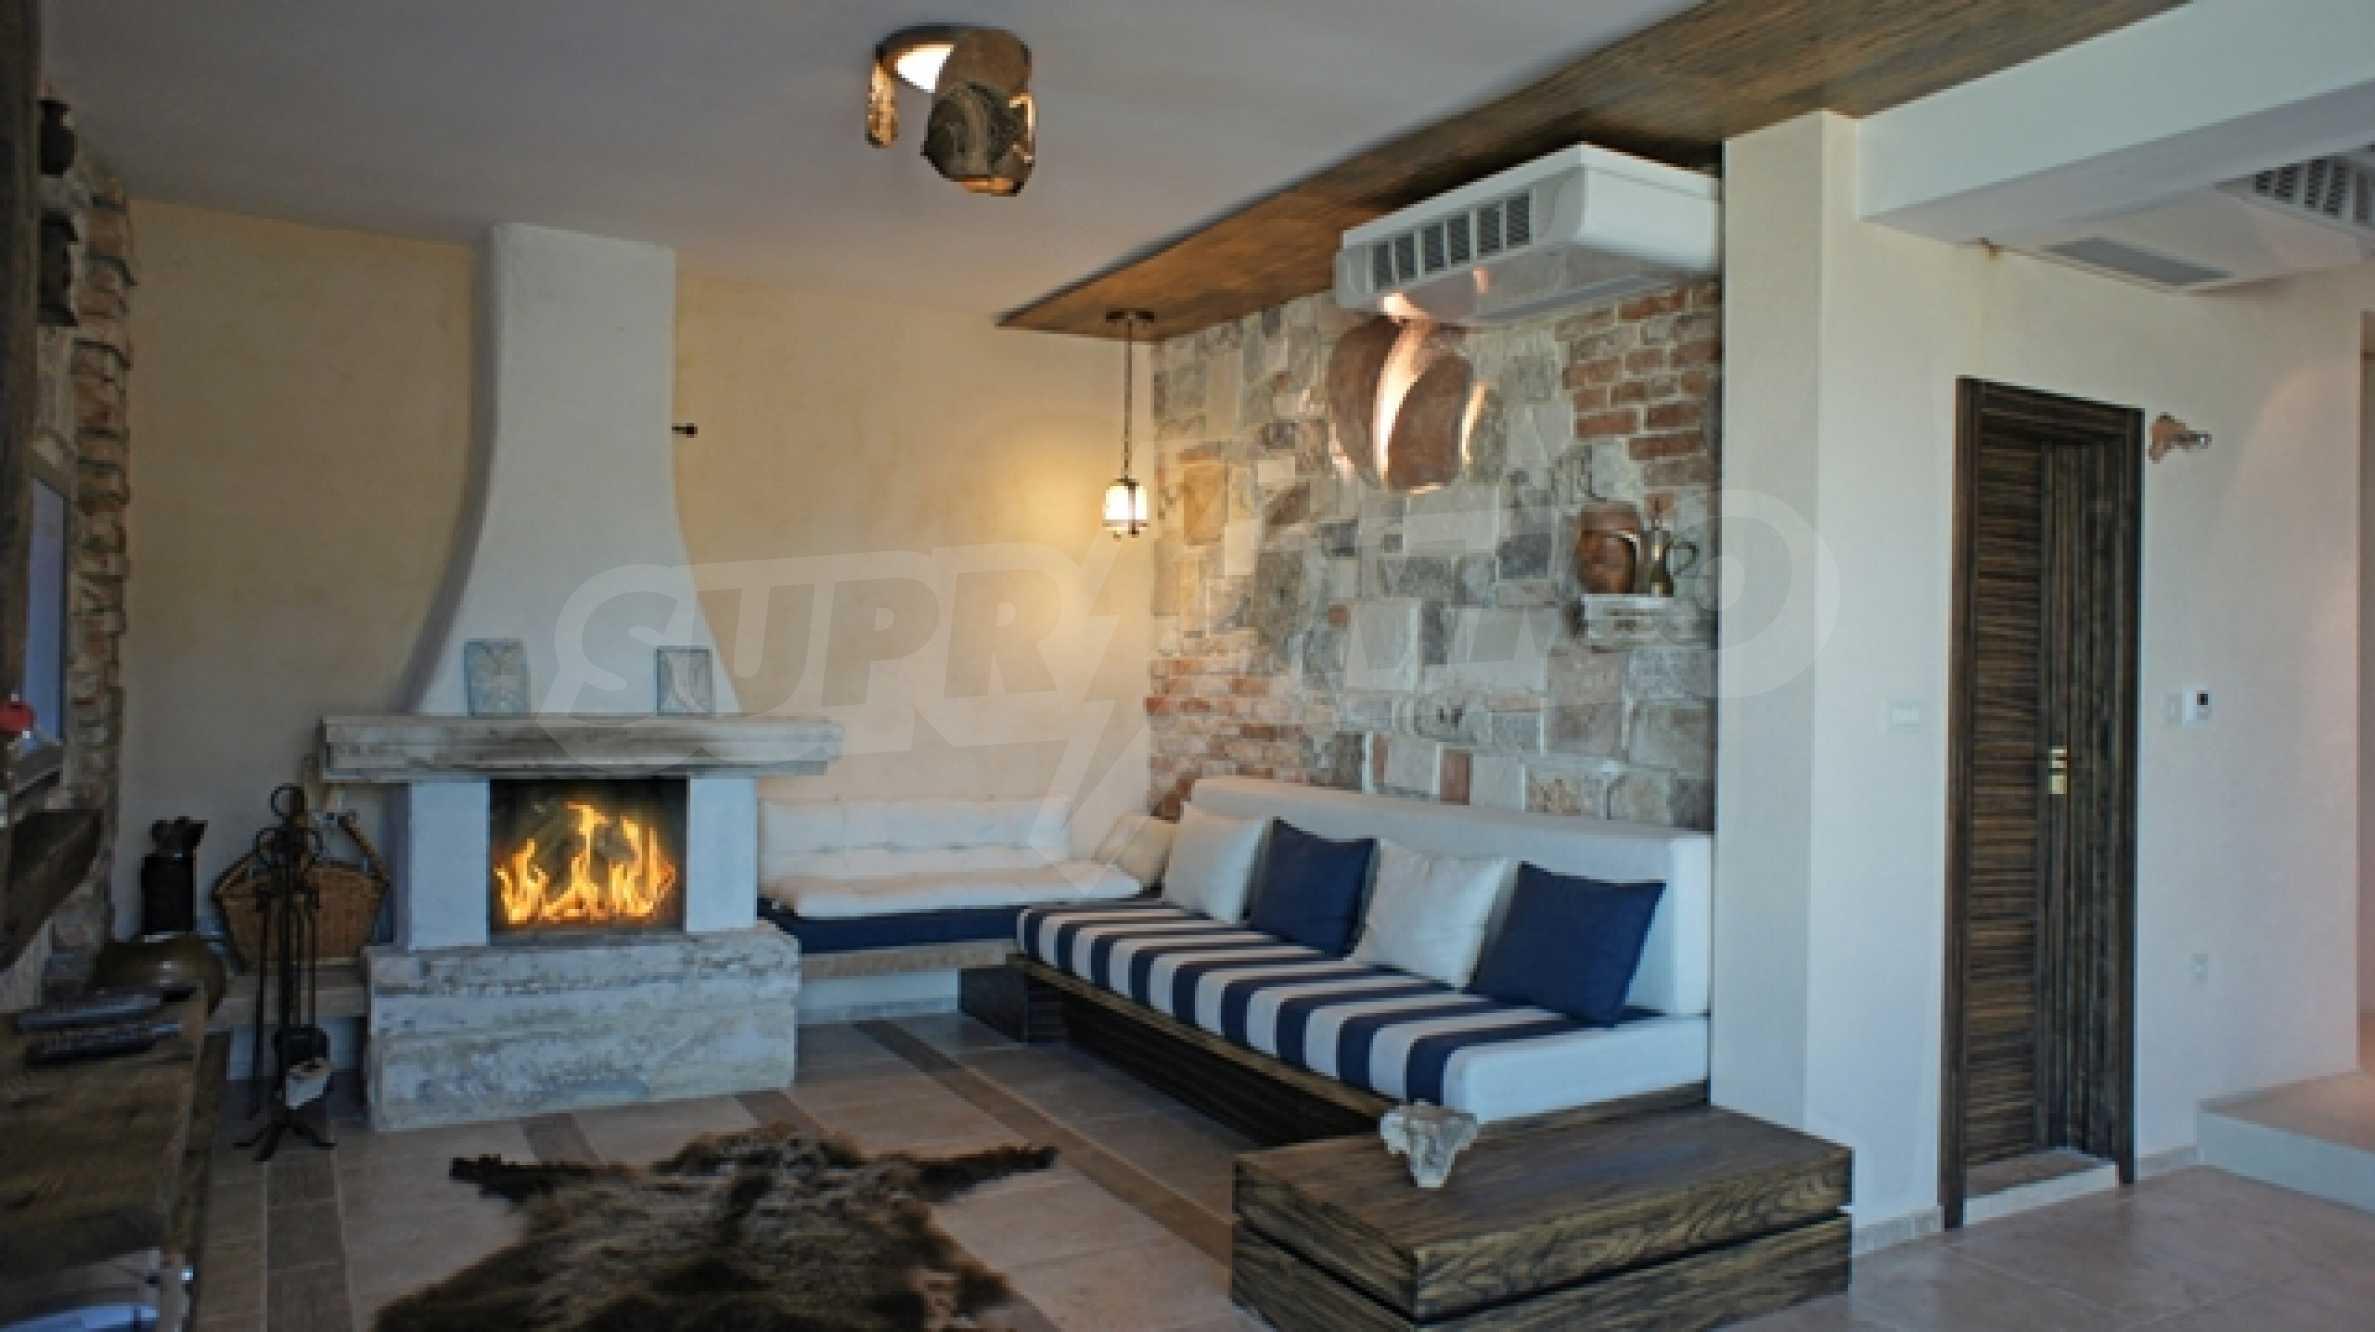 The Mediterranean style - a sense of luxury 30